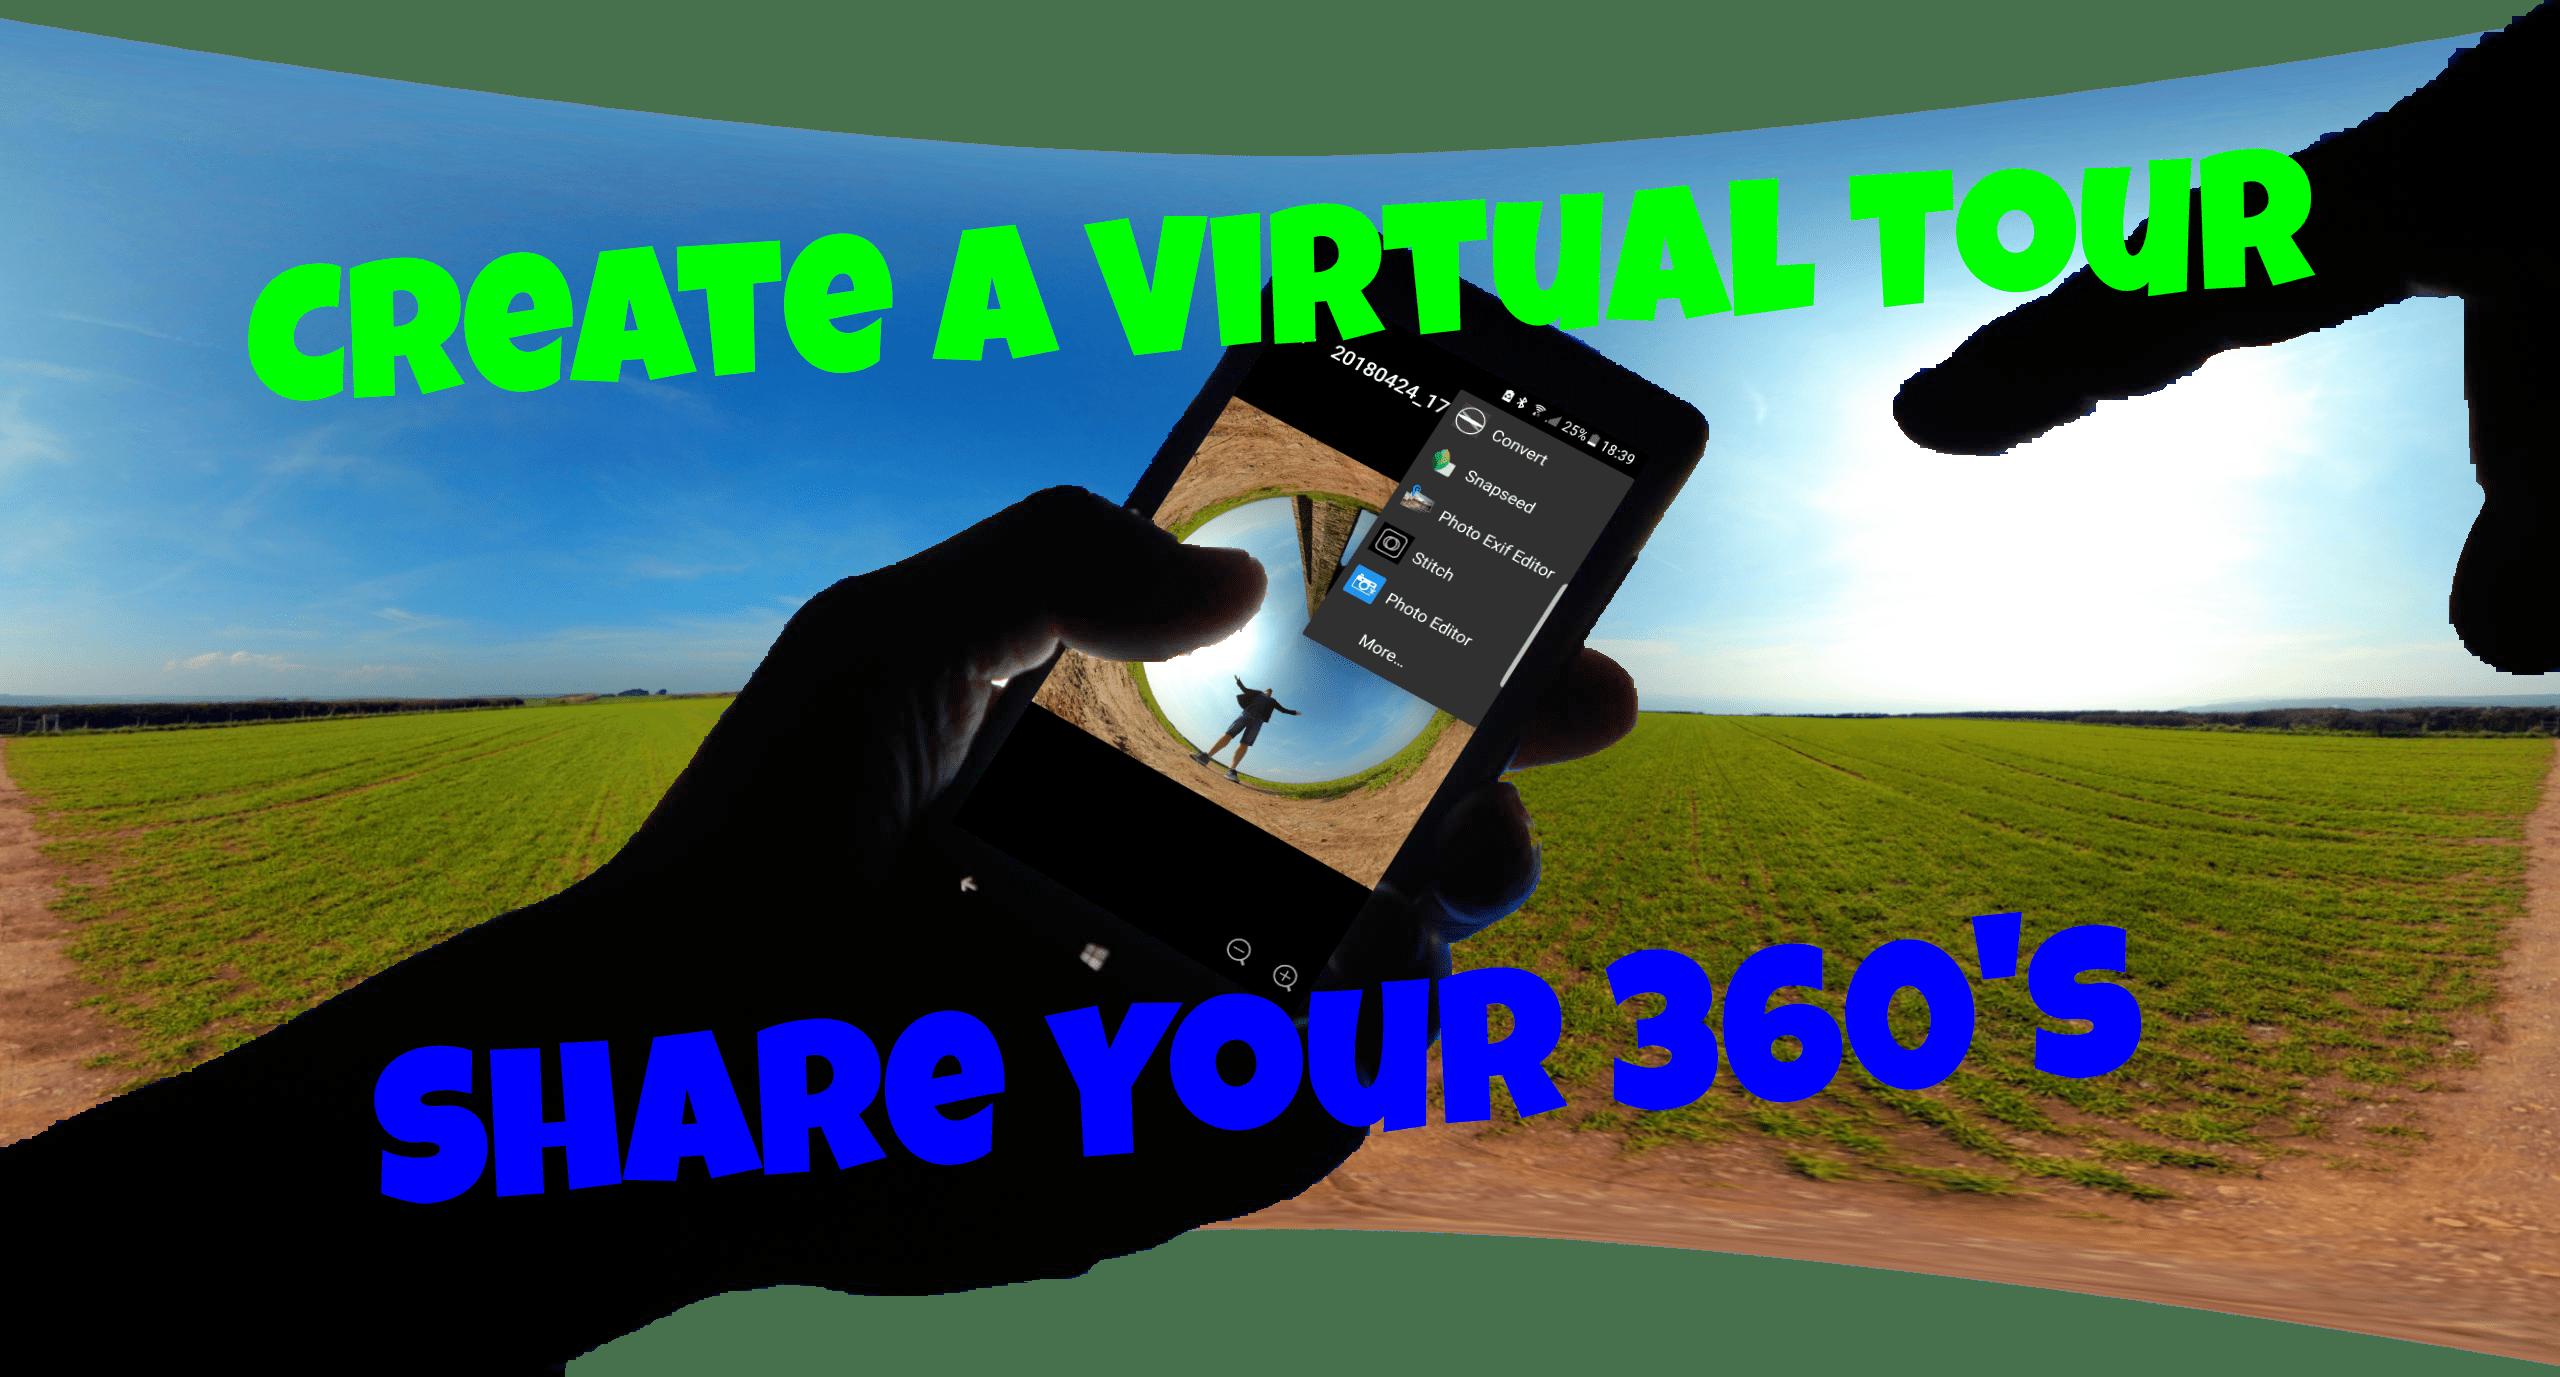 Create Virtual Tours & Share Your 360's - Ash Blagdon 360º